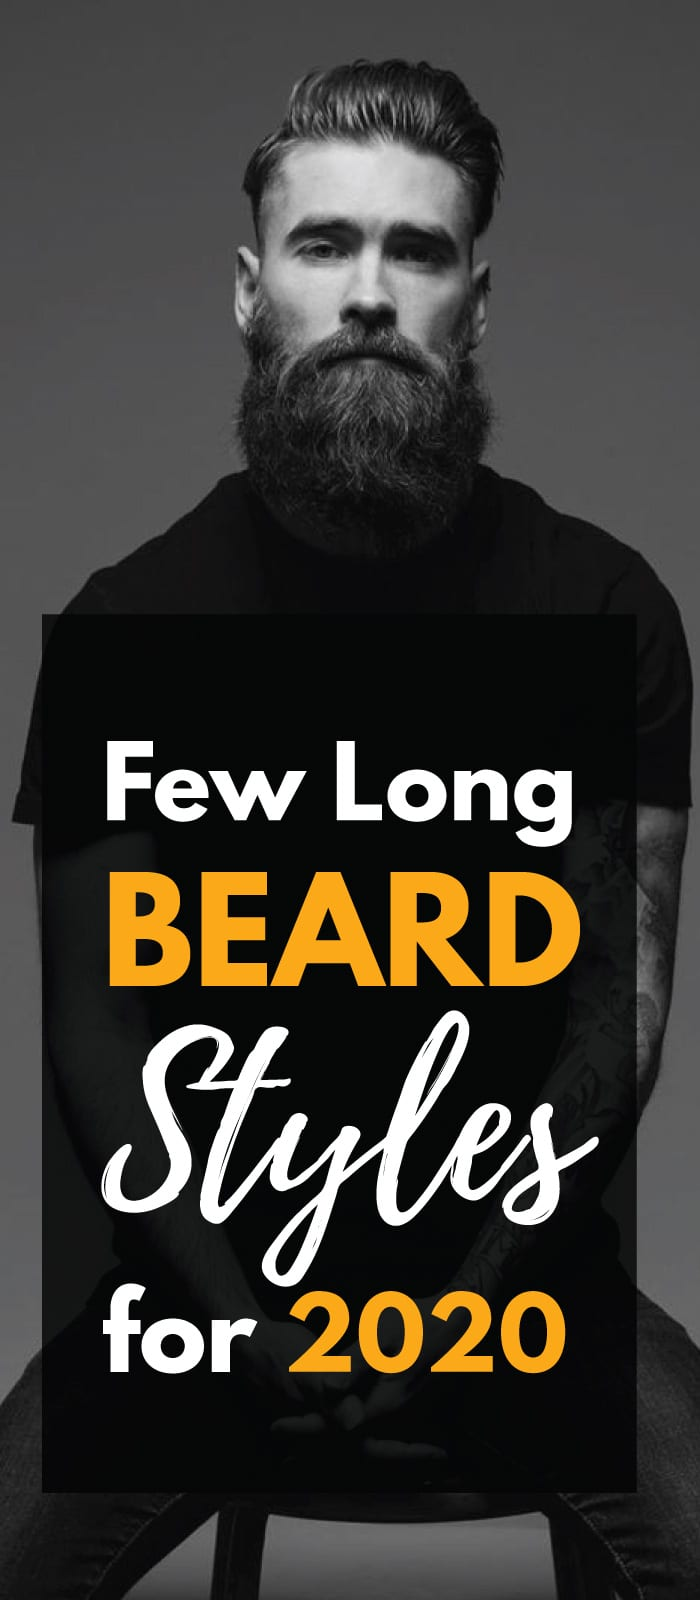 latest-beard-style-trends-in-2020